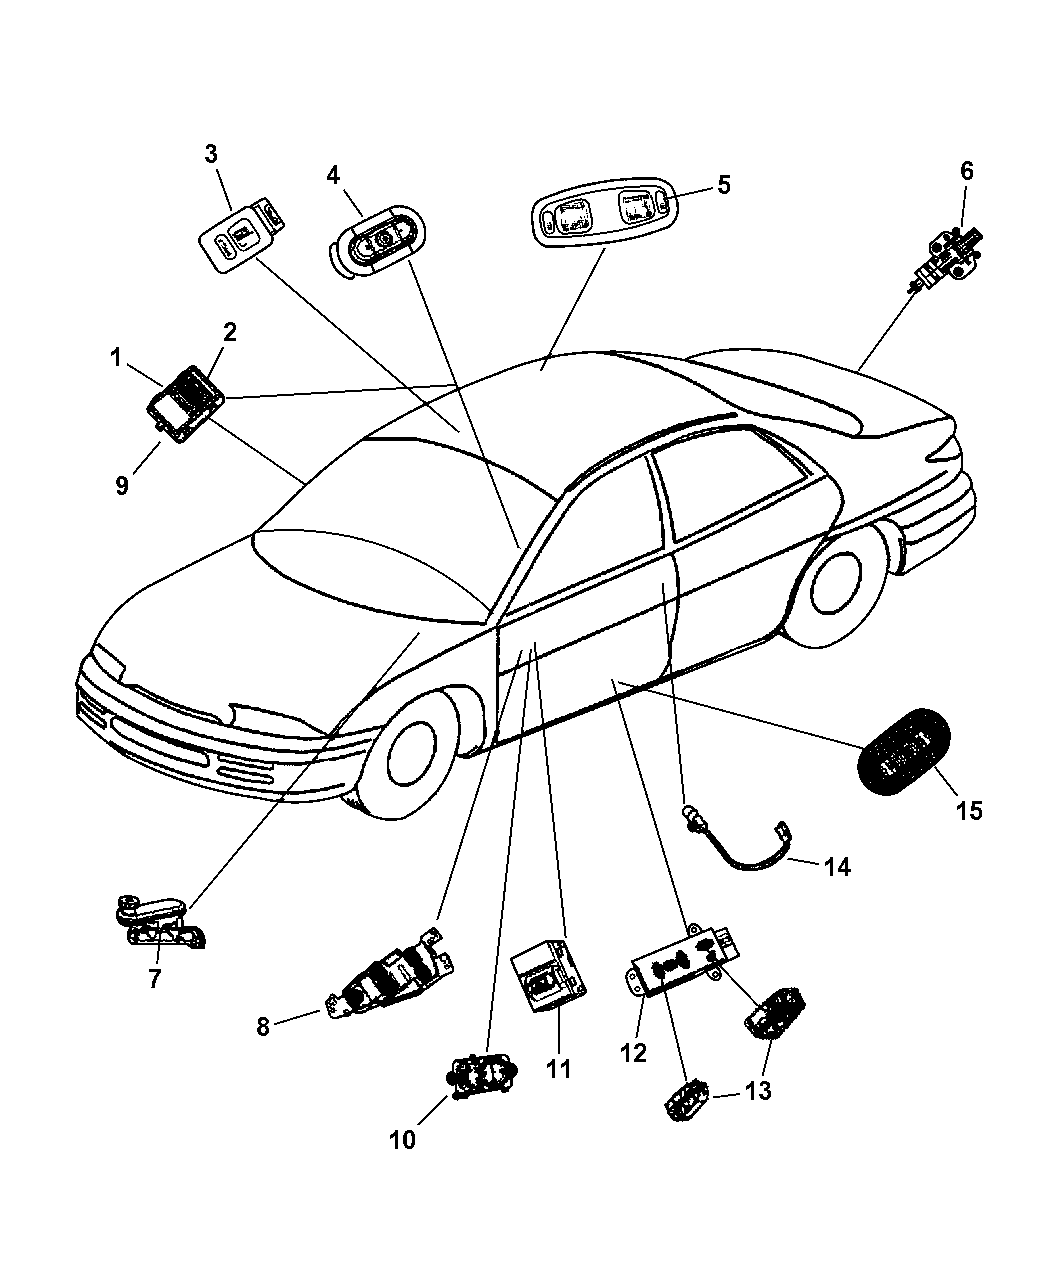 91 dodge dakota radio wiring harness dodge dakota radio wiring diagram for 1987 2000 chrysler concorde door parts imageresizertool com #5